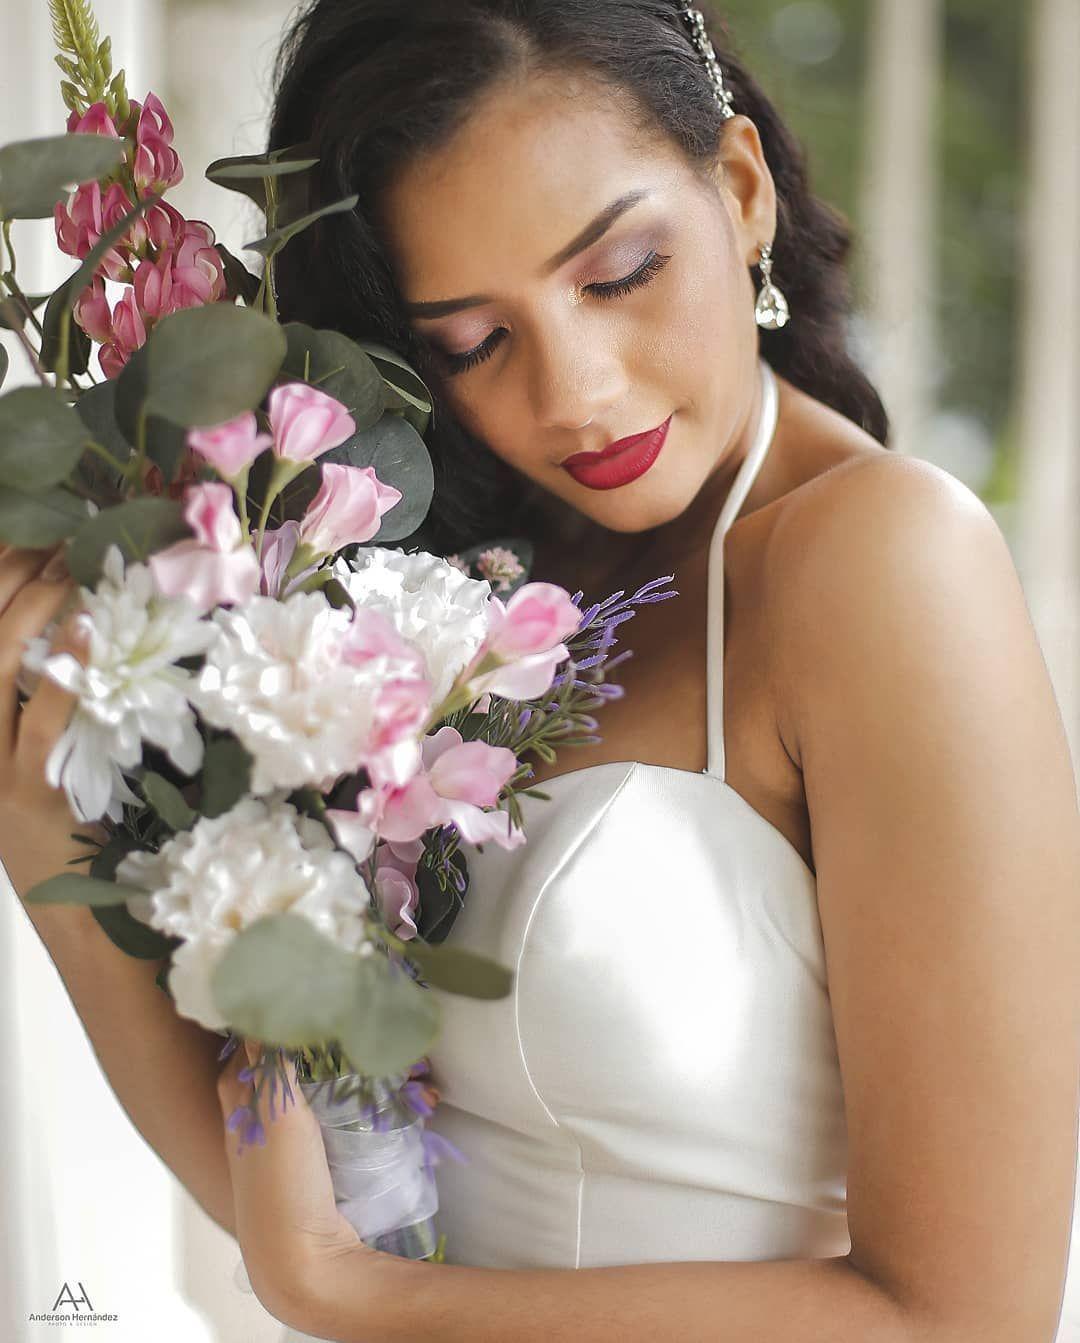 Eva & Nestor👏  @evamaria195  @praedium  @duckensep @Luiggyweddindplanner  #boda #preboda #wedding #together #husbandandwife #blessed #love #couplegoals #lifestyle #goals #love #forever #nature #rio #like #porsiempre  #photography #amor  #instagram  #photo #art #pose #stilo